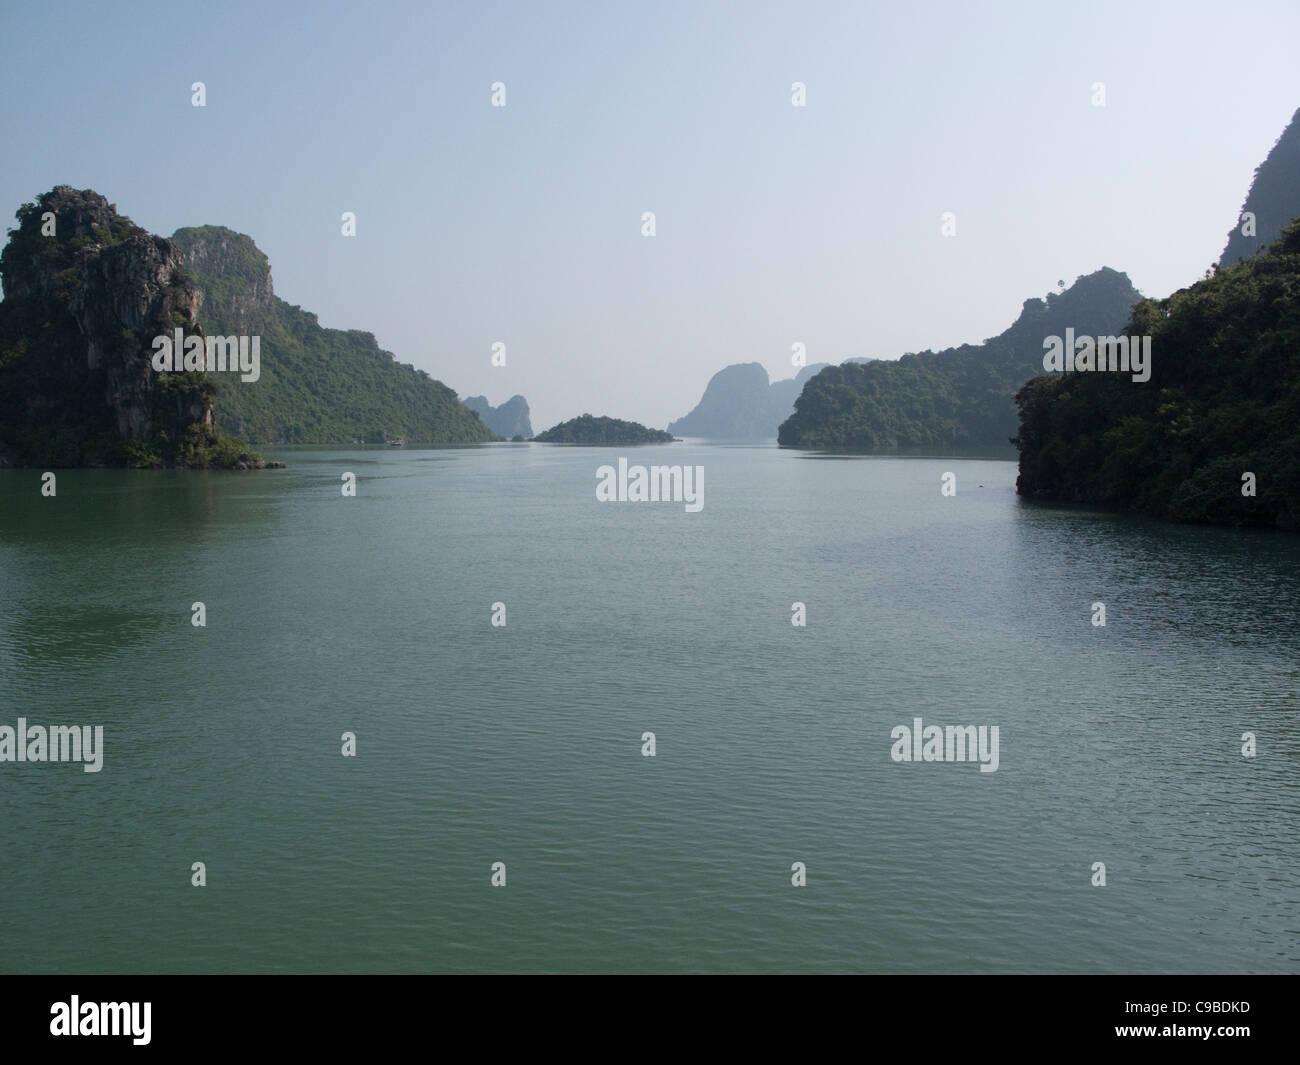 Rock formations in the South China Sea at Halong Bay, Vietnam Stock Photo